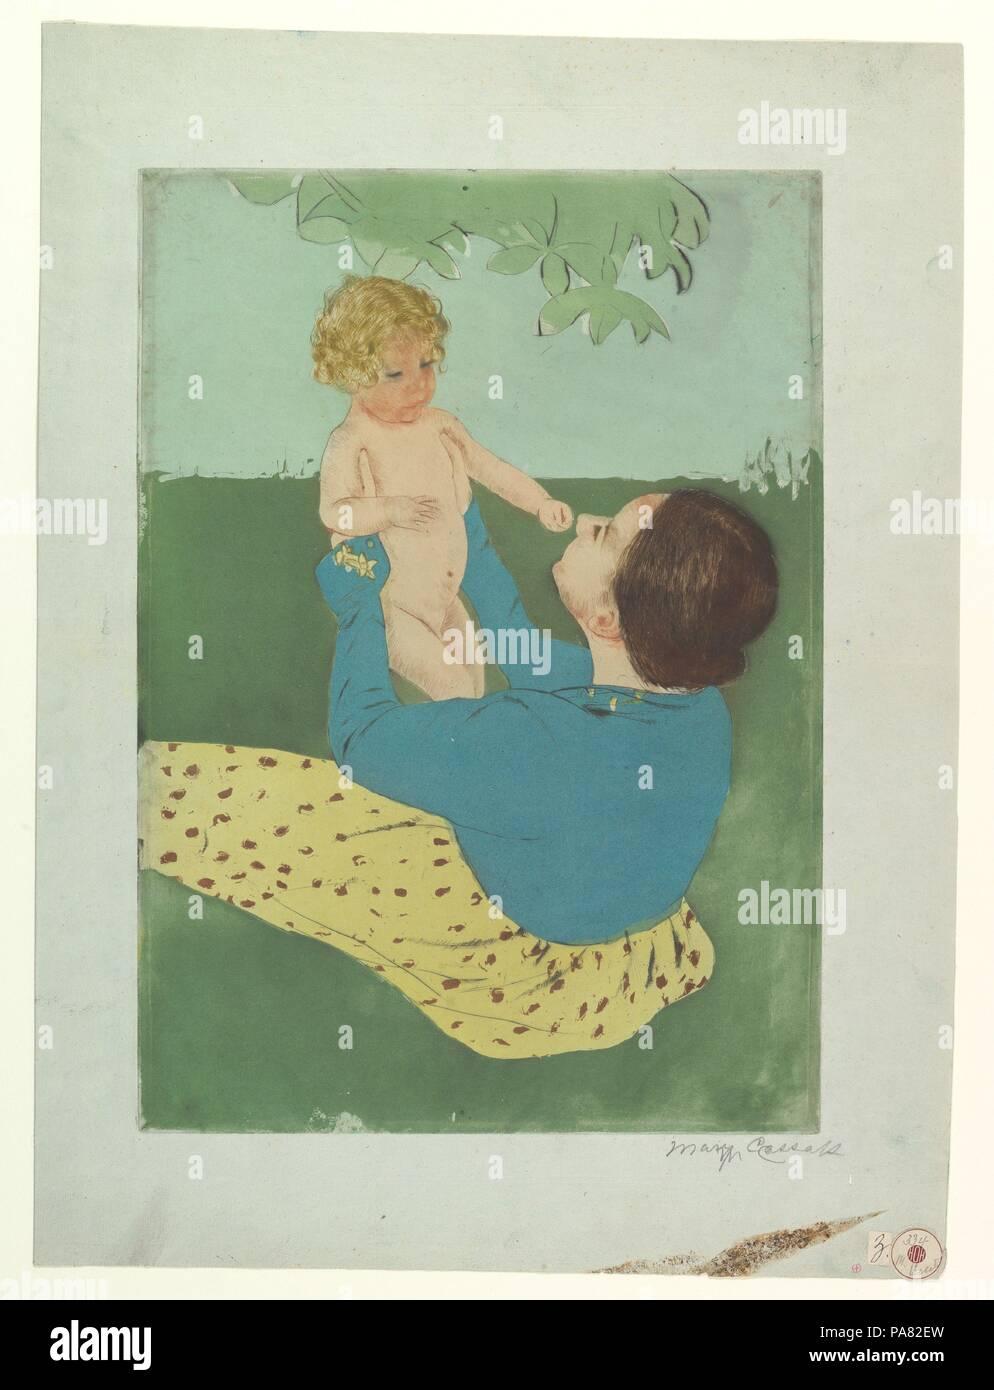 Unter der Rosskastanie Baum. Artist: Mary Cassatt (Amerikanische, Pittsburgh, Pennsylvania 1844-1926 Le Mesnil-Théribus herum, Oise). Abmessungen: Platte: 15 15/16 x 11 3/16 in. (40,5 x 28,4 cm) Blatt: 20 1/2 x 15 1/4 in. (52,1 x 38,6 cm). Datum: 1896-97. Museum: Metropolitan Museum of Art, New York, USA. Stockfoto